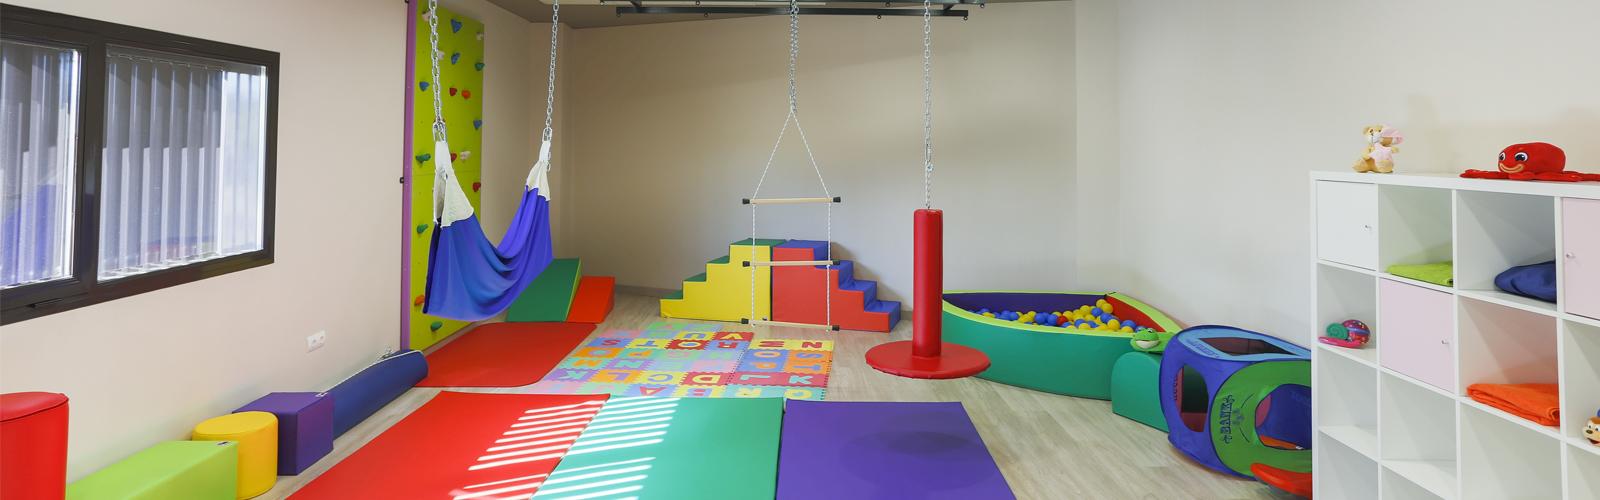 Sala de integración sensorial